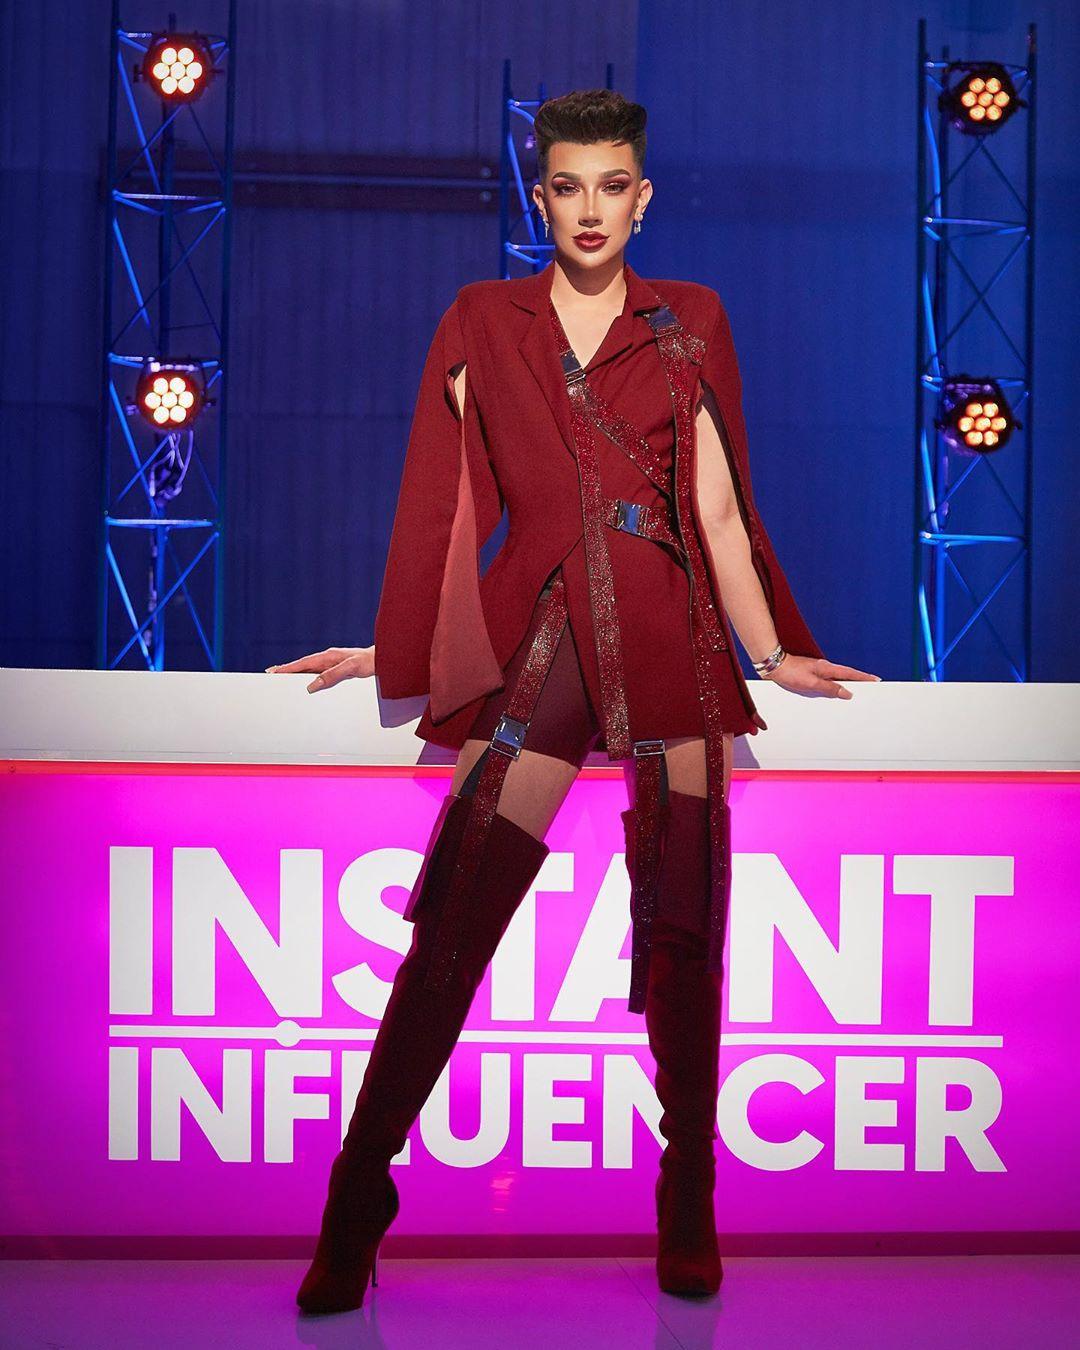 Instant Influencer: el reality show de James Charles